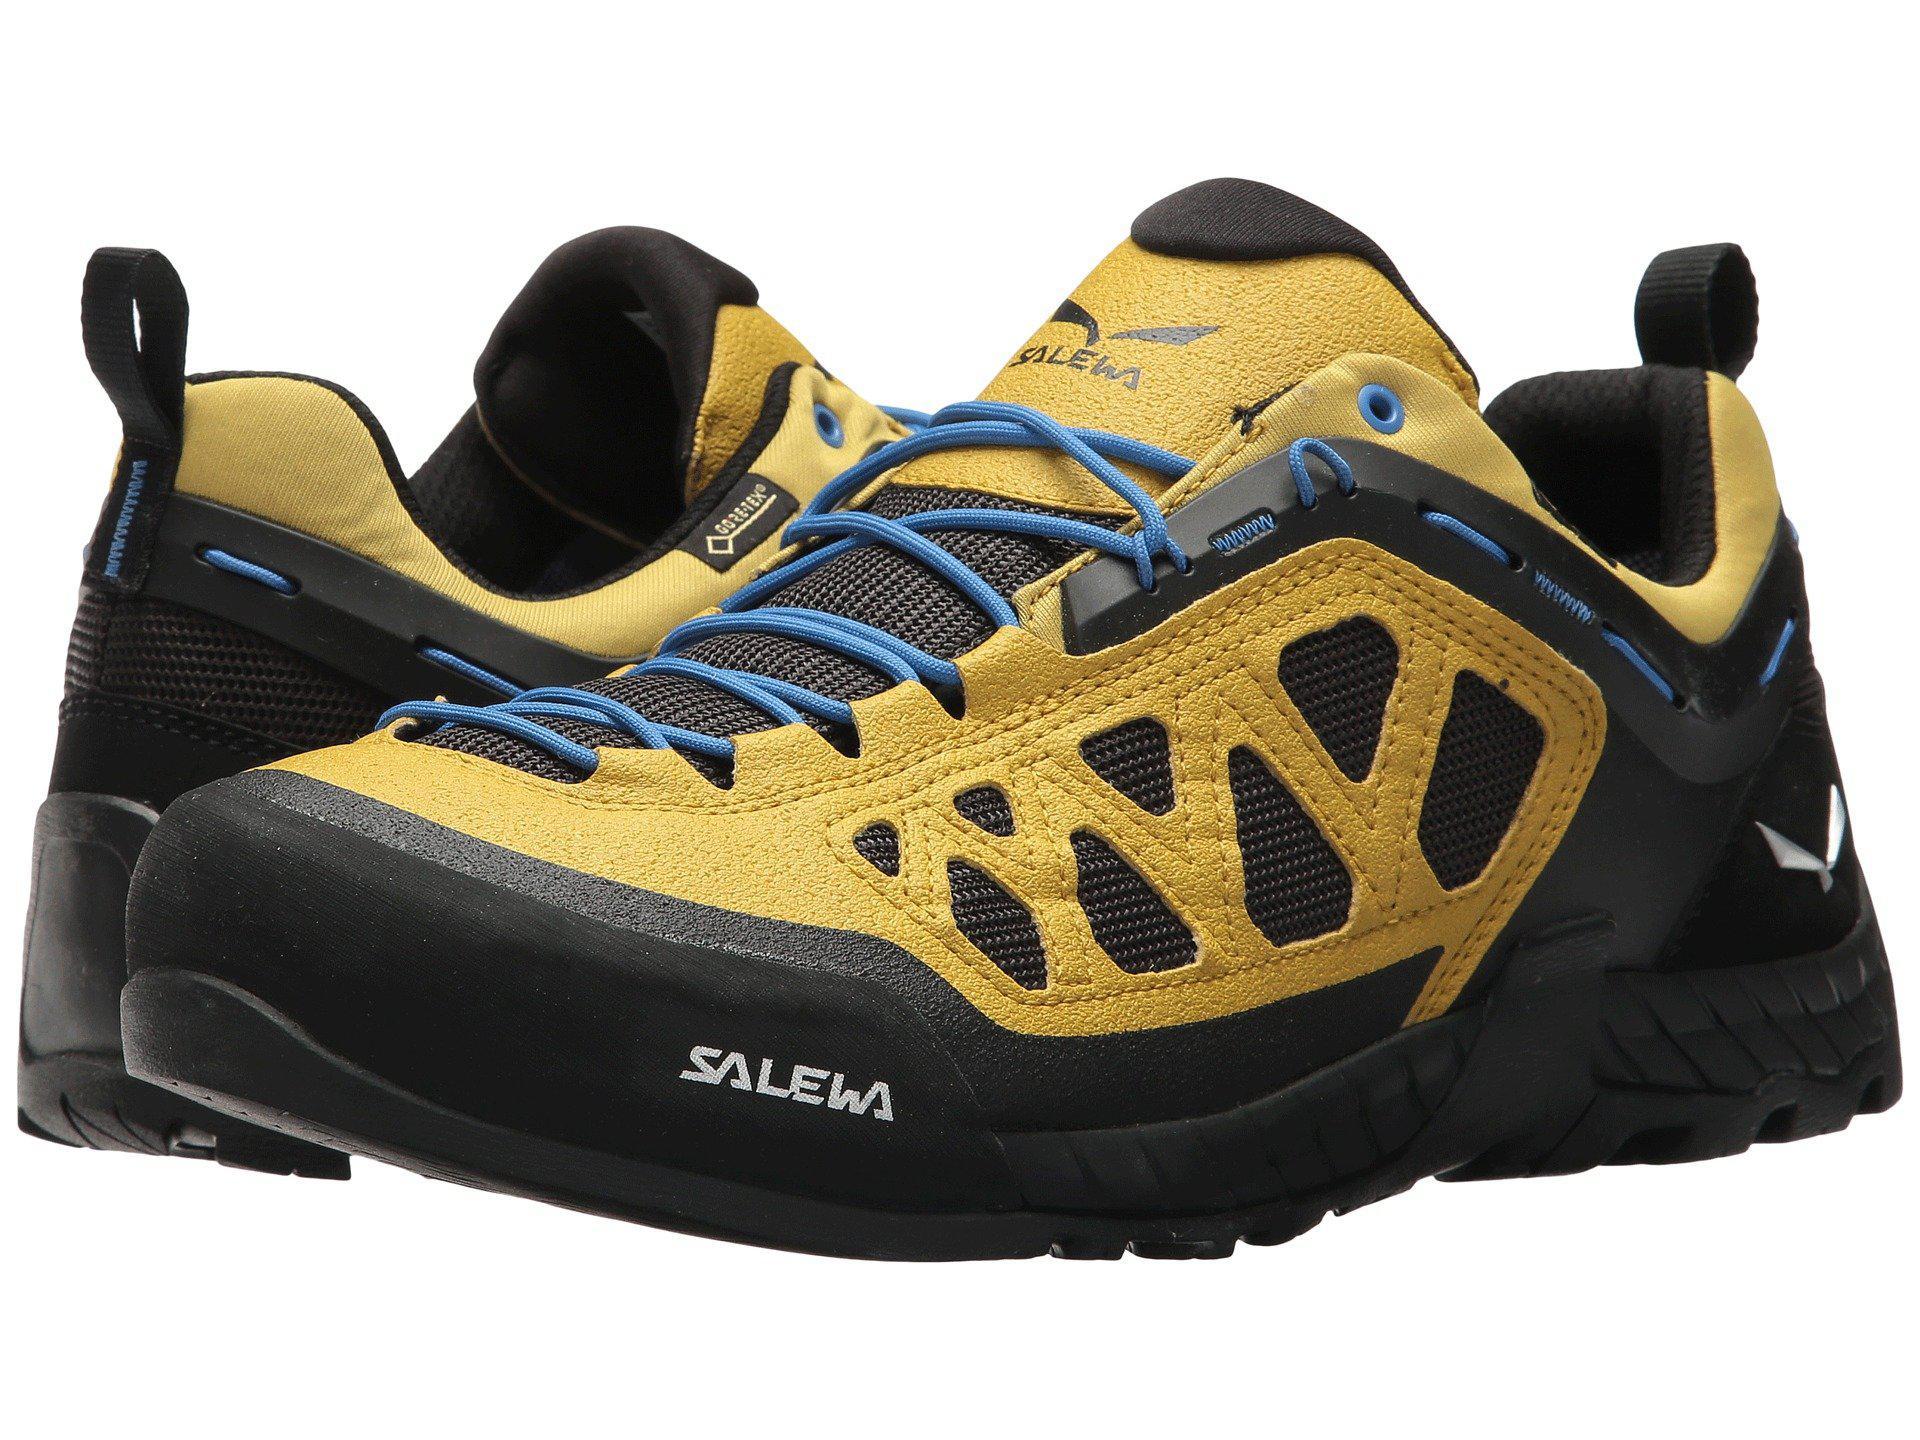 Lyst - Salewa Firetail 3 Gtx (golden Palm black Out) Men s Shoes in ... 415dd5810e88